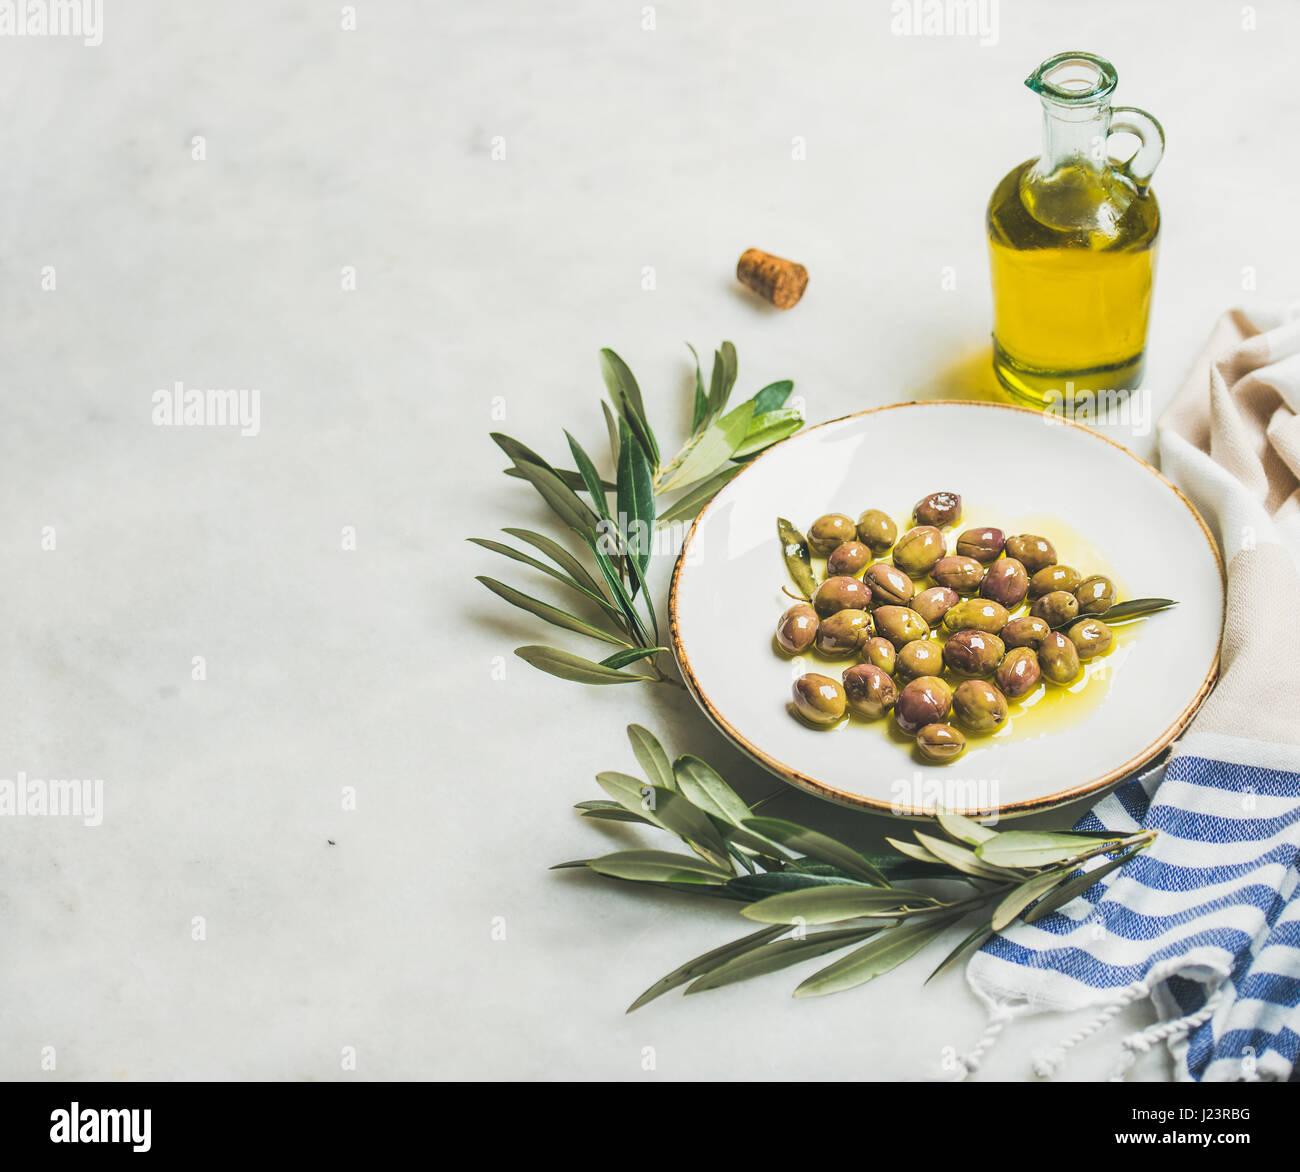 Pickled green Mediterranean olives, olive tree branch and virgin oil - Stock Image